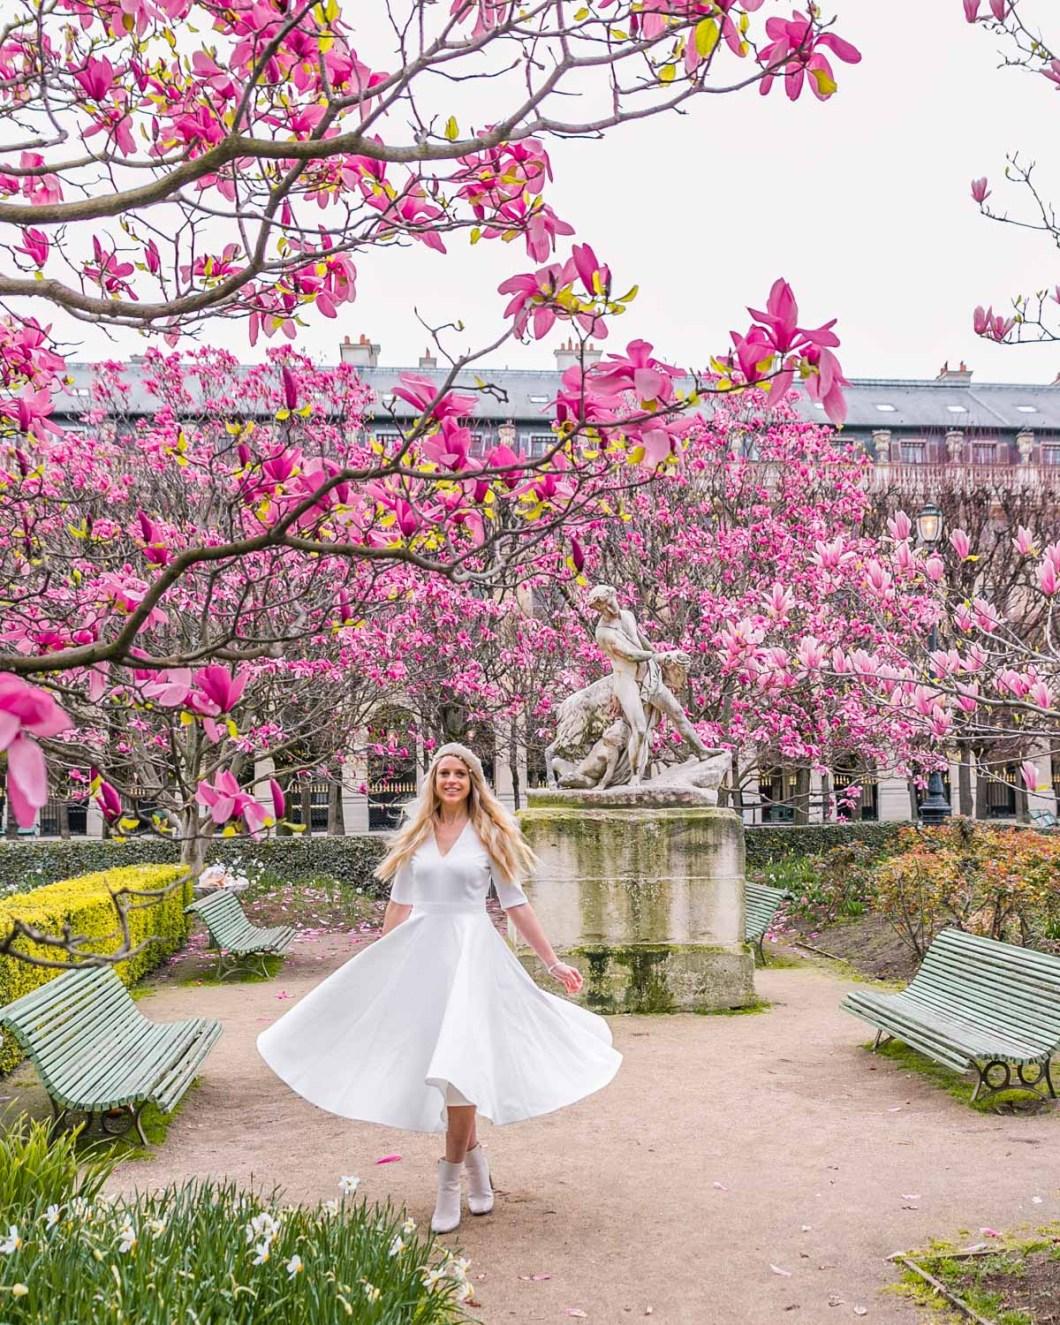 Magnolias in bloom in the garden of the Palais Royal - Paris